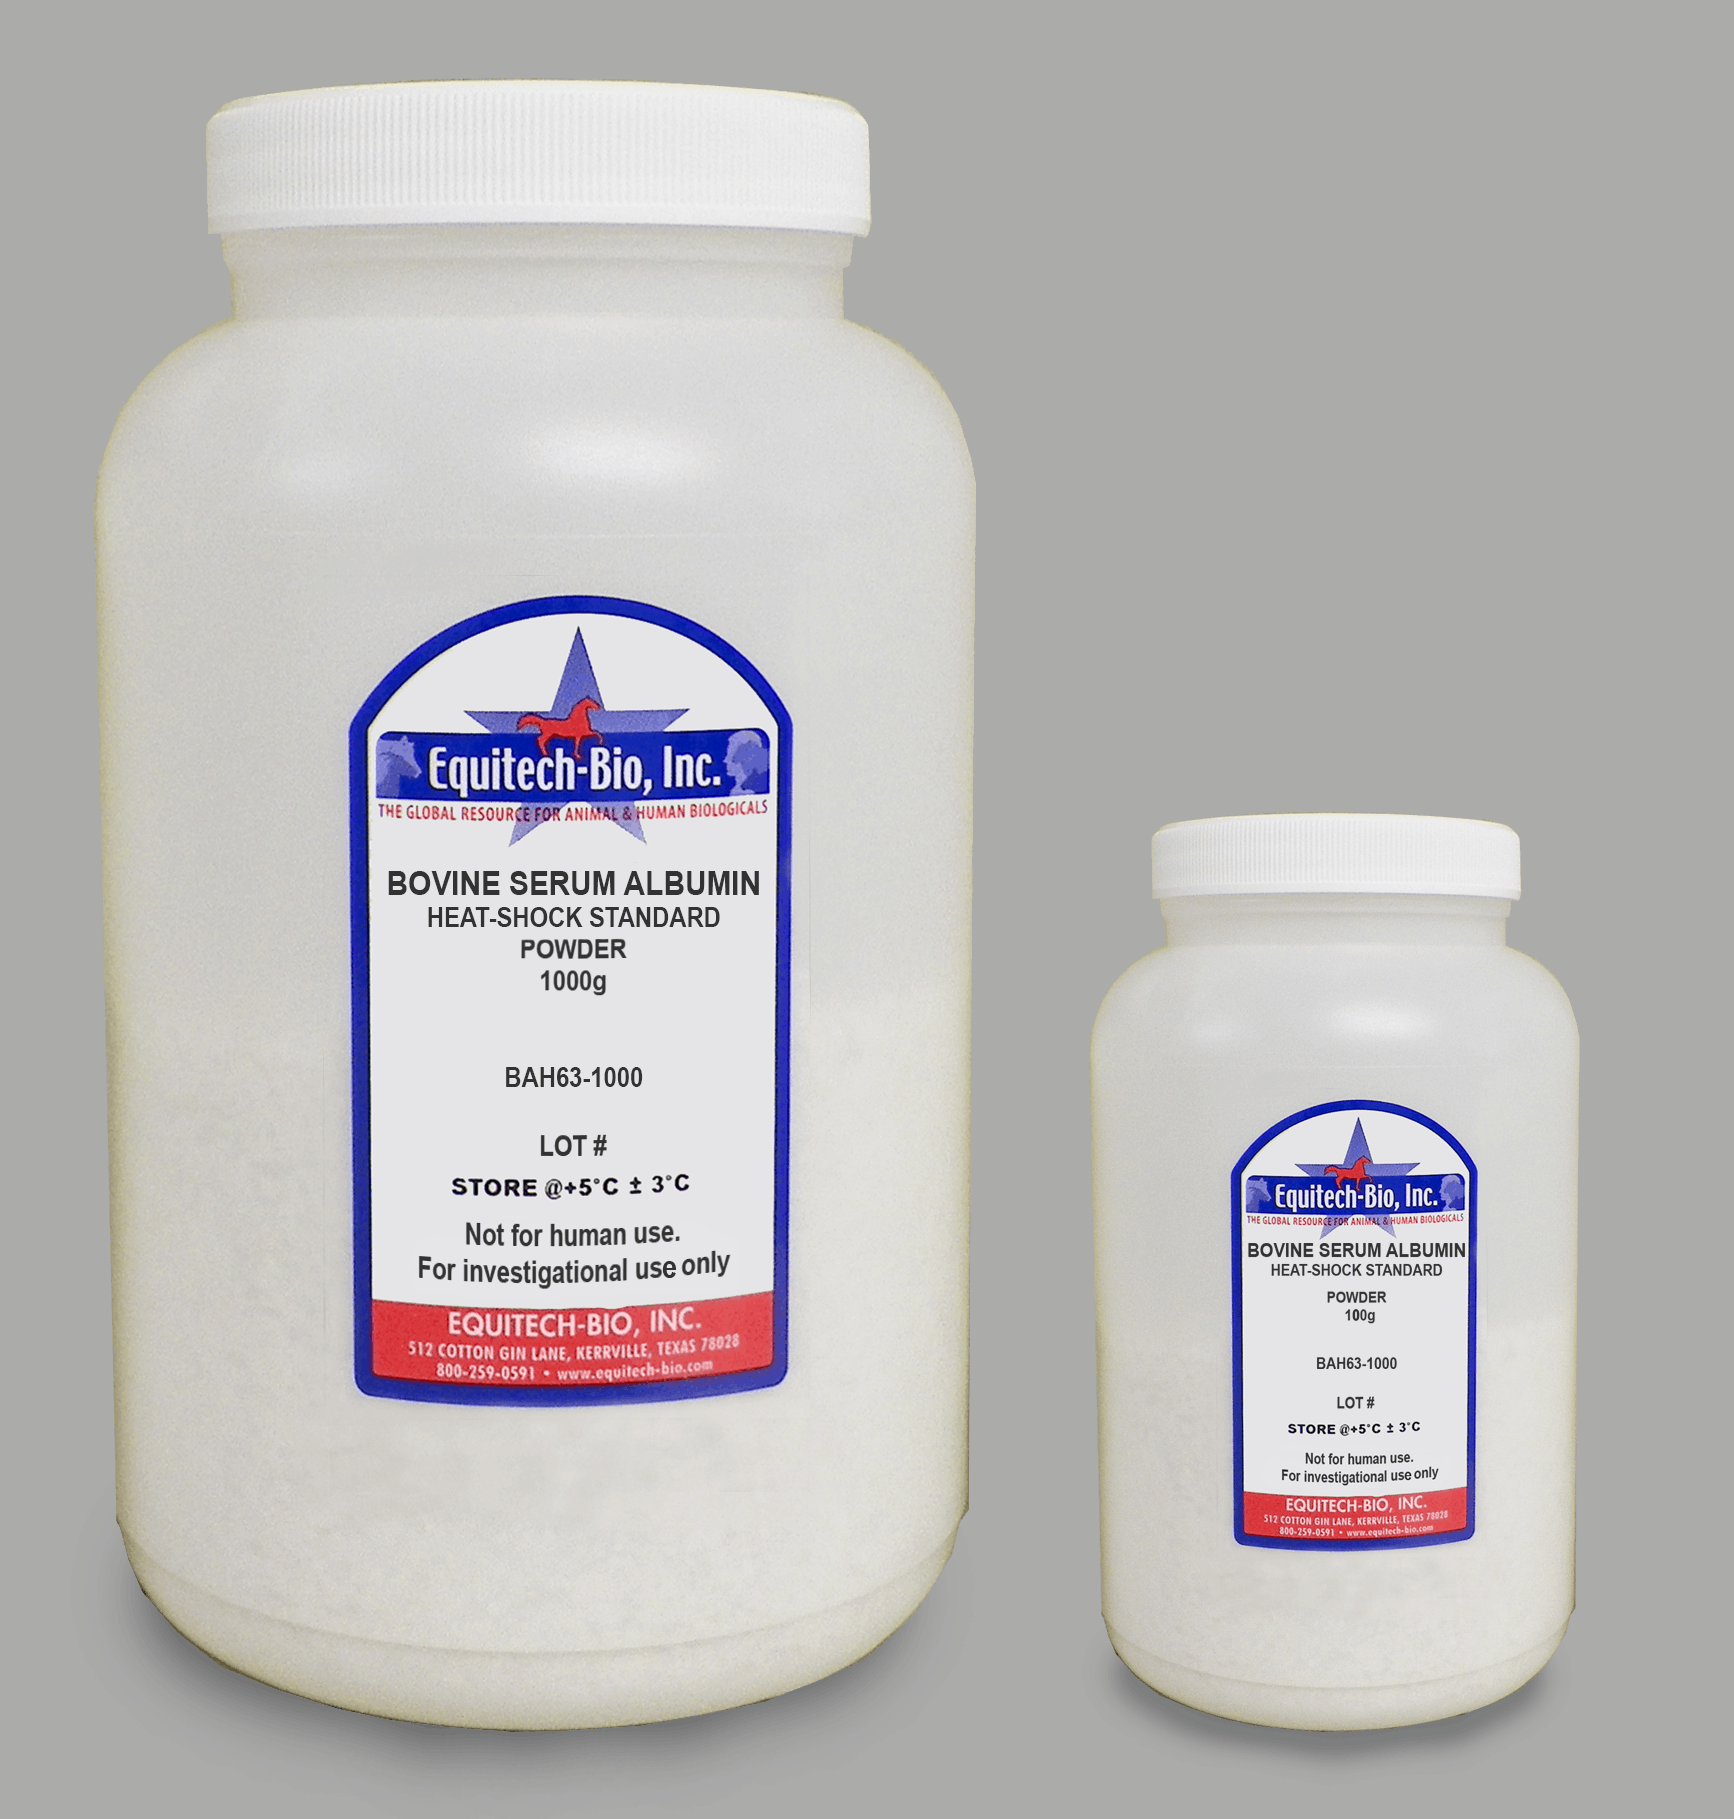 BAH63 -- Standard Grade Heat Shock Bovine Serum Albumin Powder pH 5.2